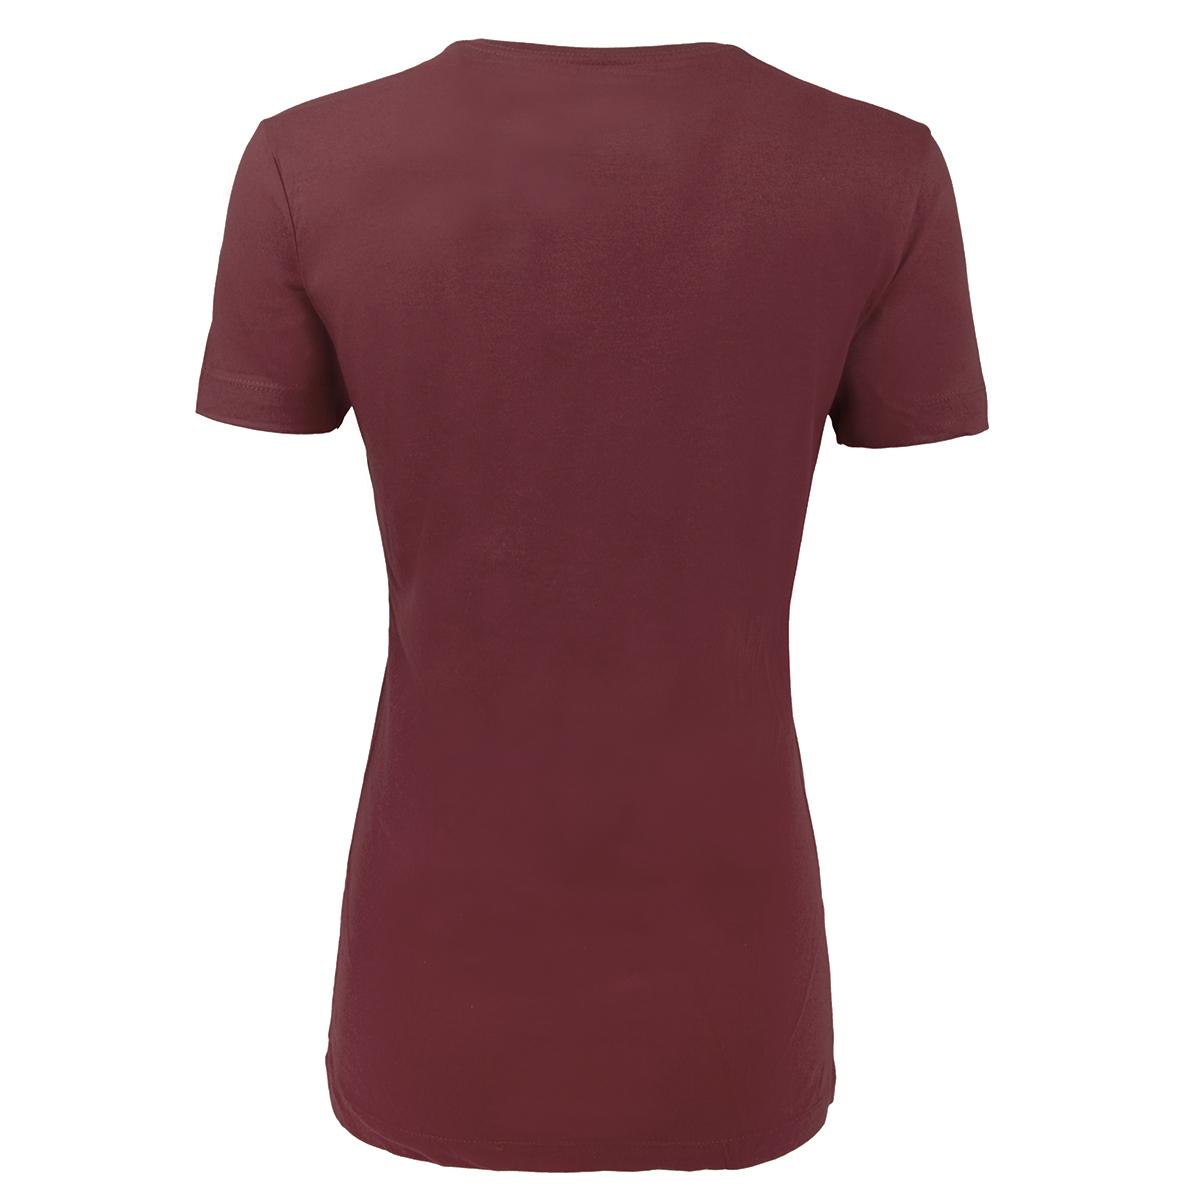 Nike-Women-039-s-Cotton-Slim-Fit-T-Shirt thumbnail 13